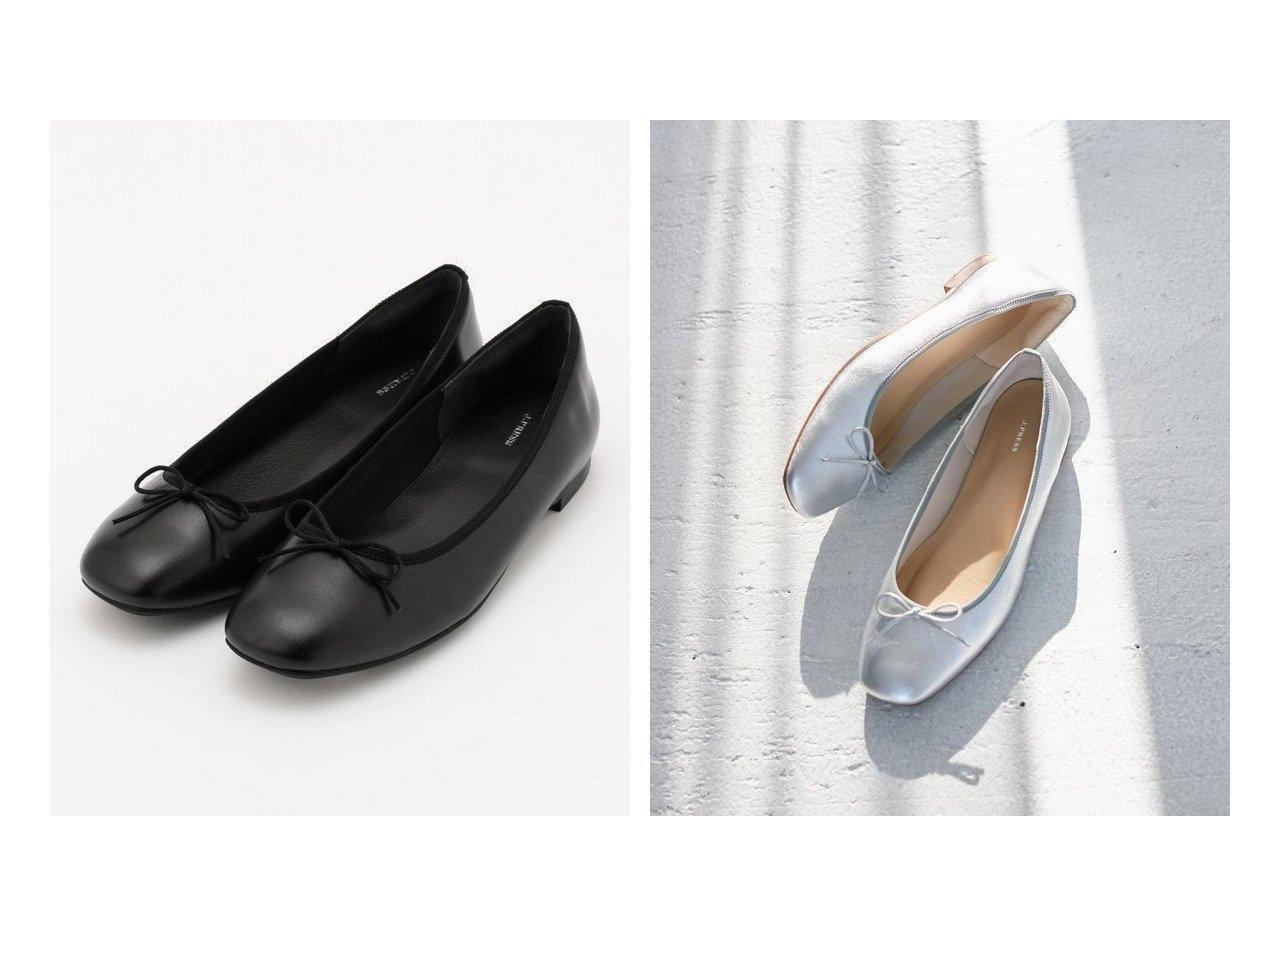 【J.PRESS/ジェイ プレス】の【高反発】スクエアトゥ バレエシューズ 【シューズ・靴】おすすめ!人気、トレンド・レディースファッションの通販 おすすめで人気の流行・トレンド、ファッションの通販商品 メンズファッション・キッズファッション・インテリア・家具・レディースファッション・服の通販 founy(ファニー) https://founy.com/ ファッション Fashion レディースファッション WOMEN インソール クッション シューズ バレエ フィット フラット 再入荷 Restock/Back in Stock/Re Arrival  ID:crp329100000025455